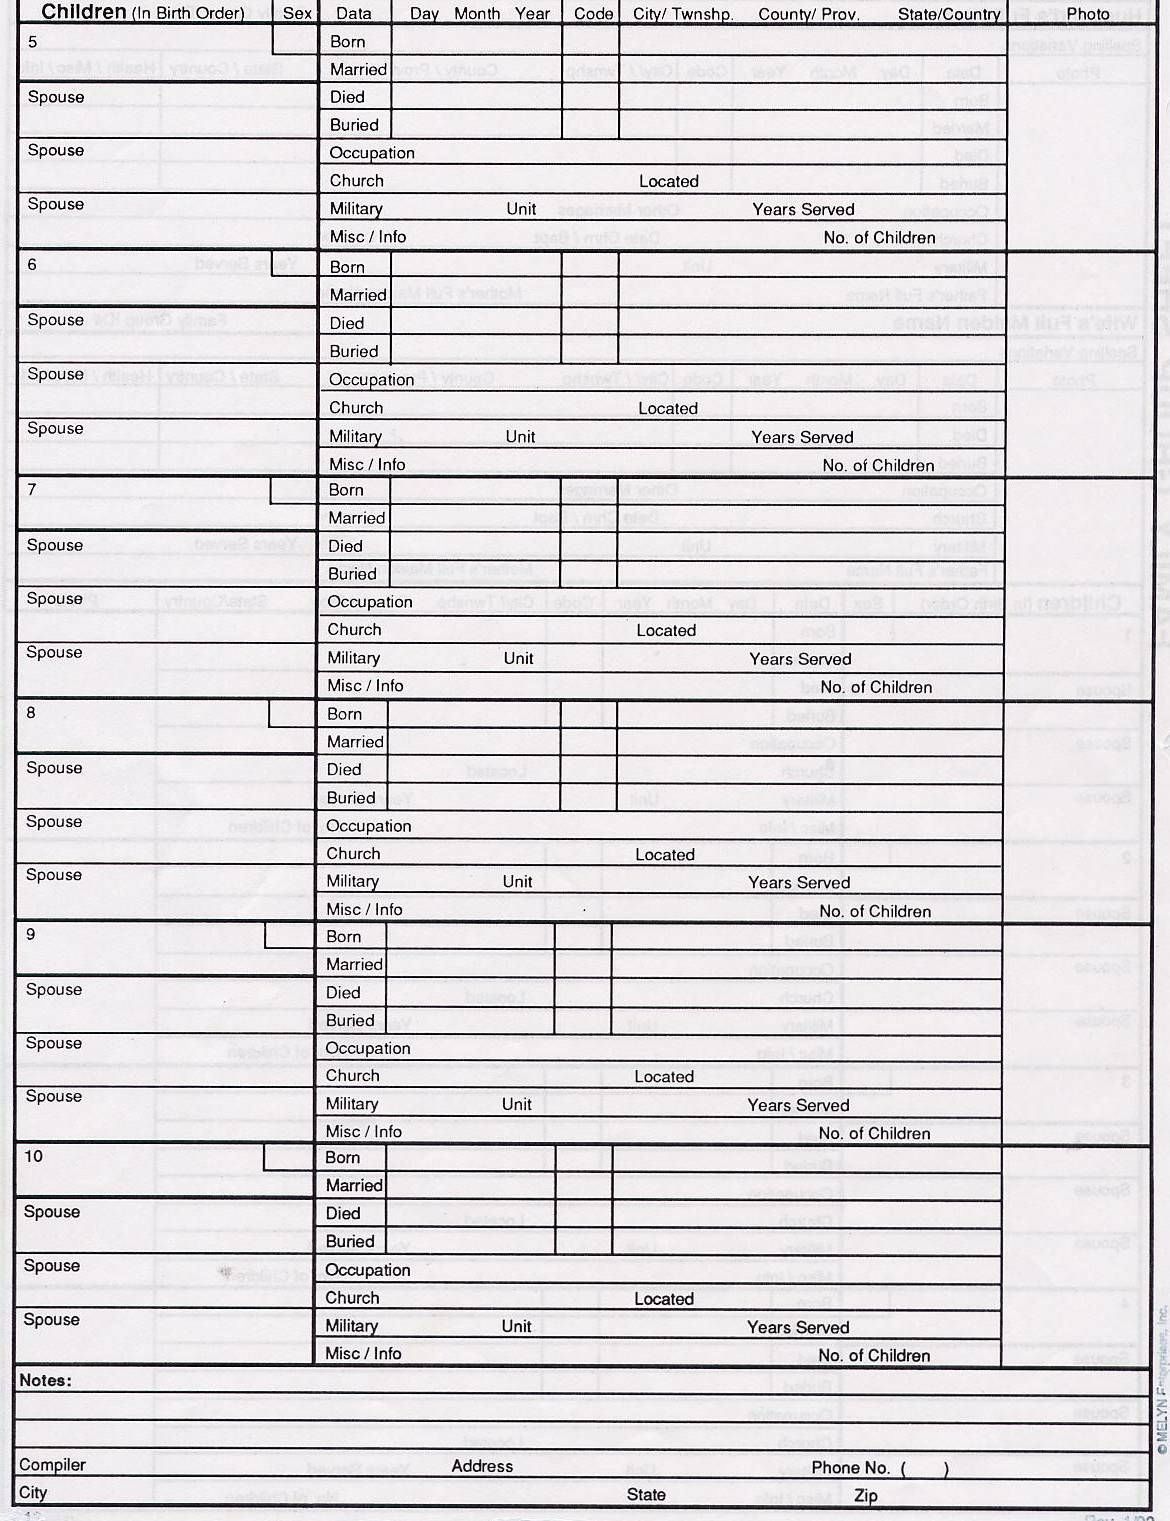 Family Group Sheet No 2 1 170 1 521 Pixels